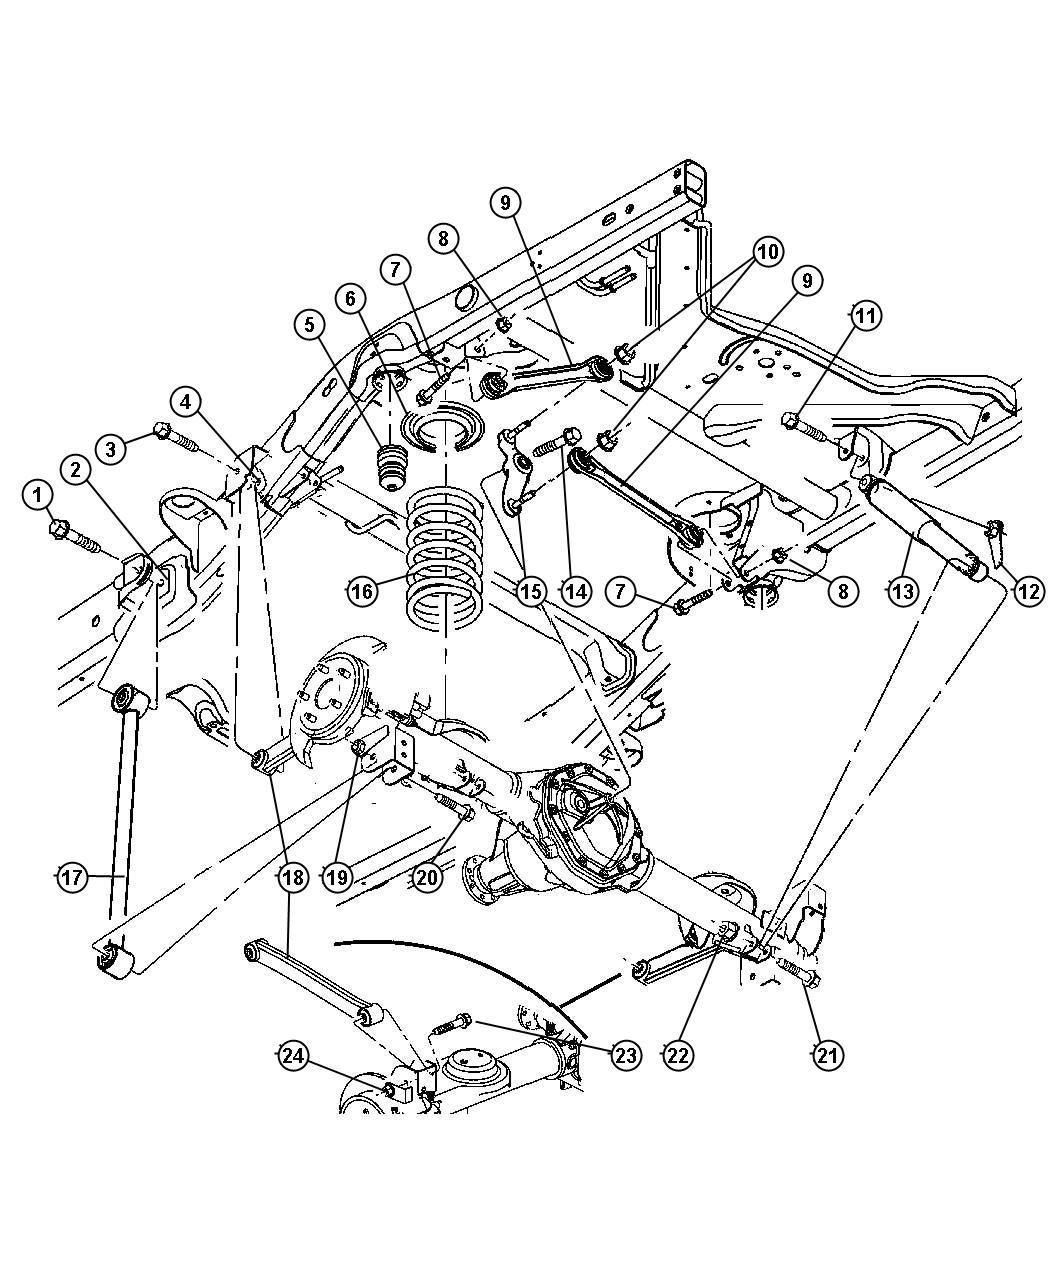 Chrysler Aspen Arm Lower Control Rear Suspension